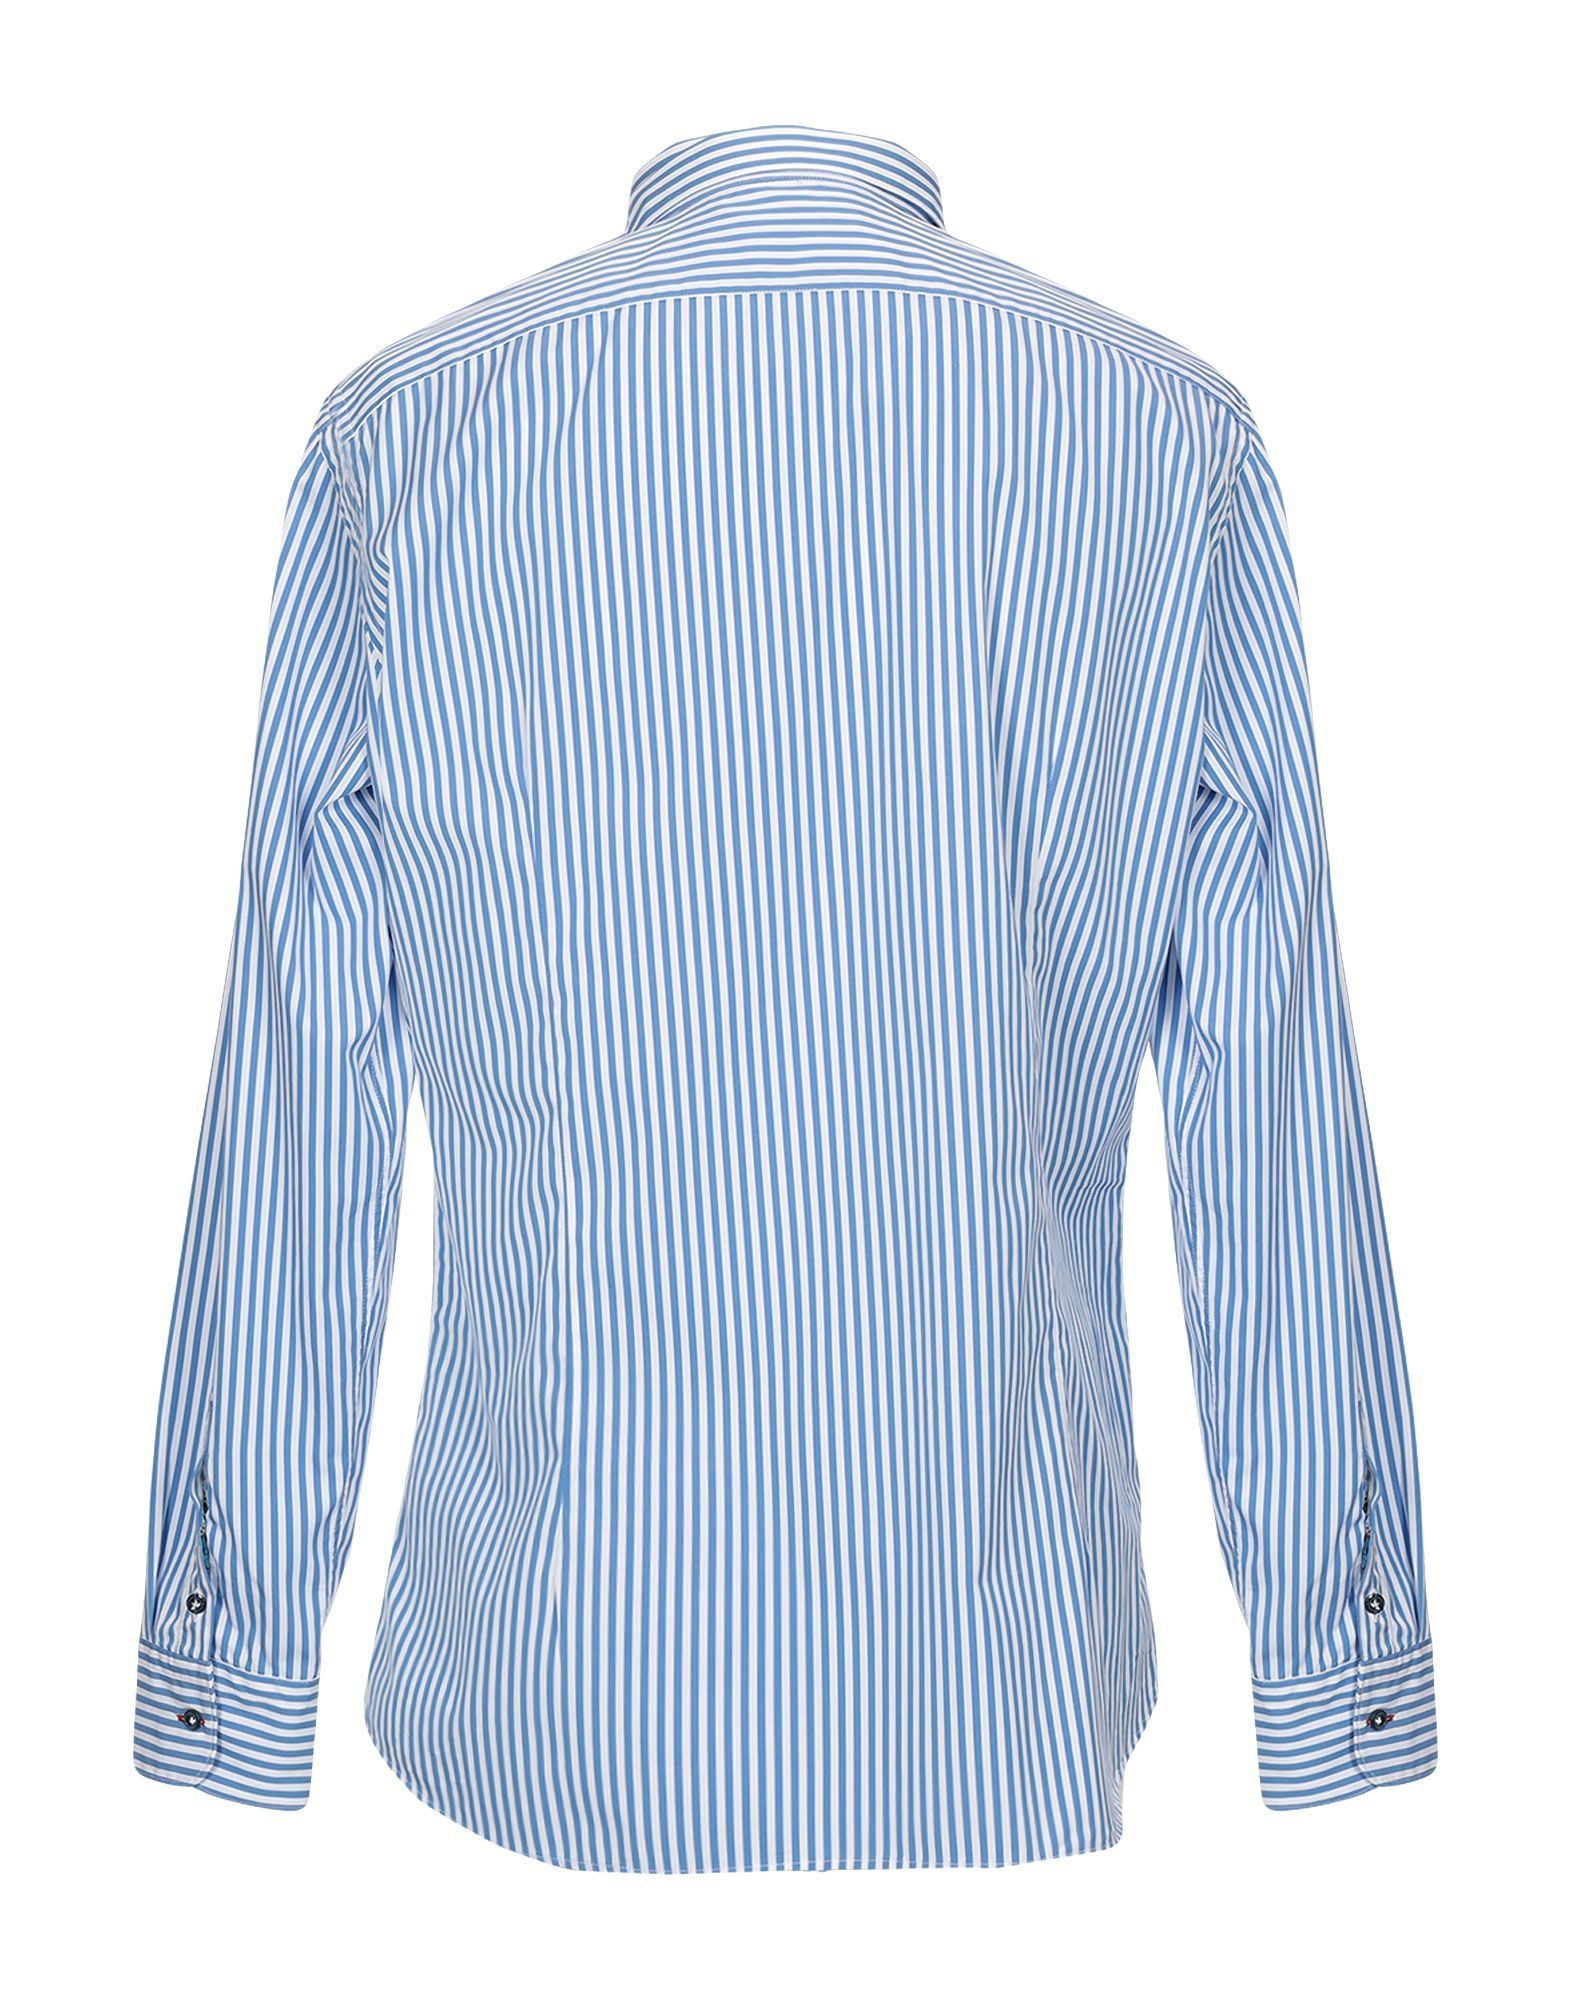 Aglini Azure Stripe Cotton Shirt